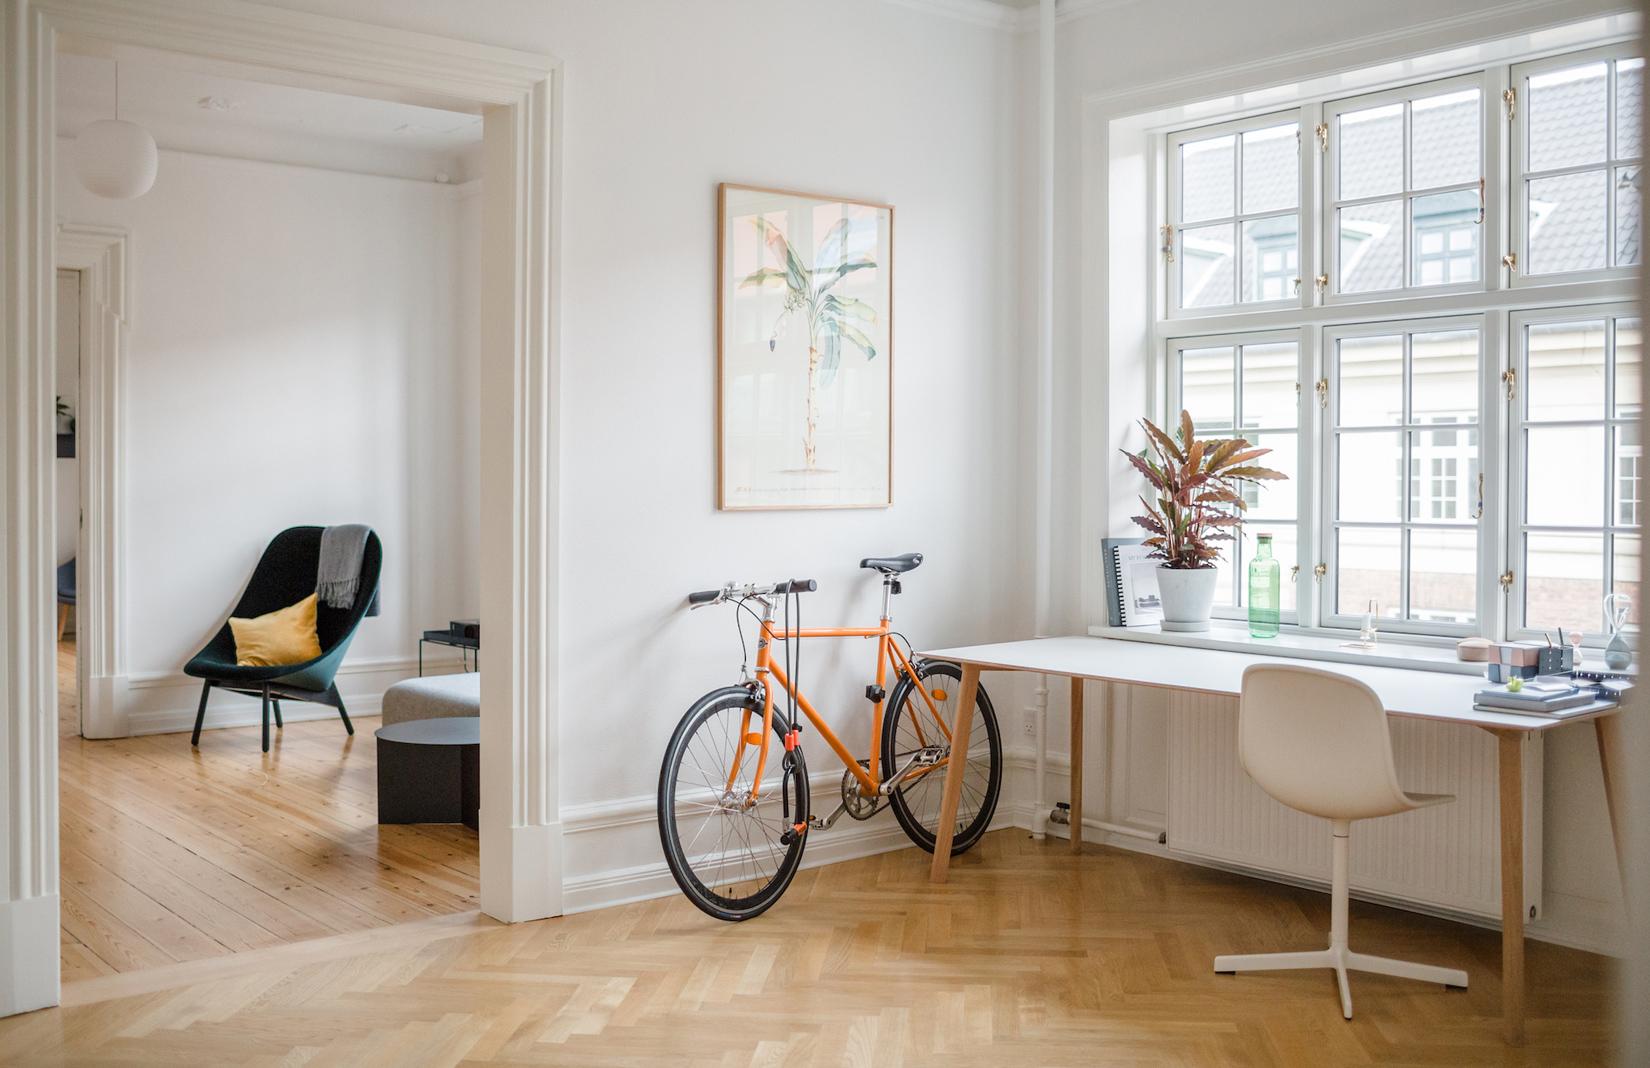 Inside Life X co-living accommodation